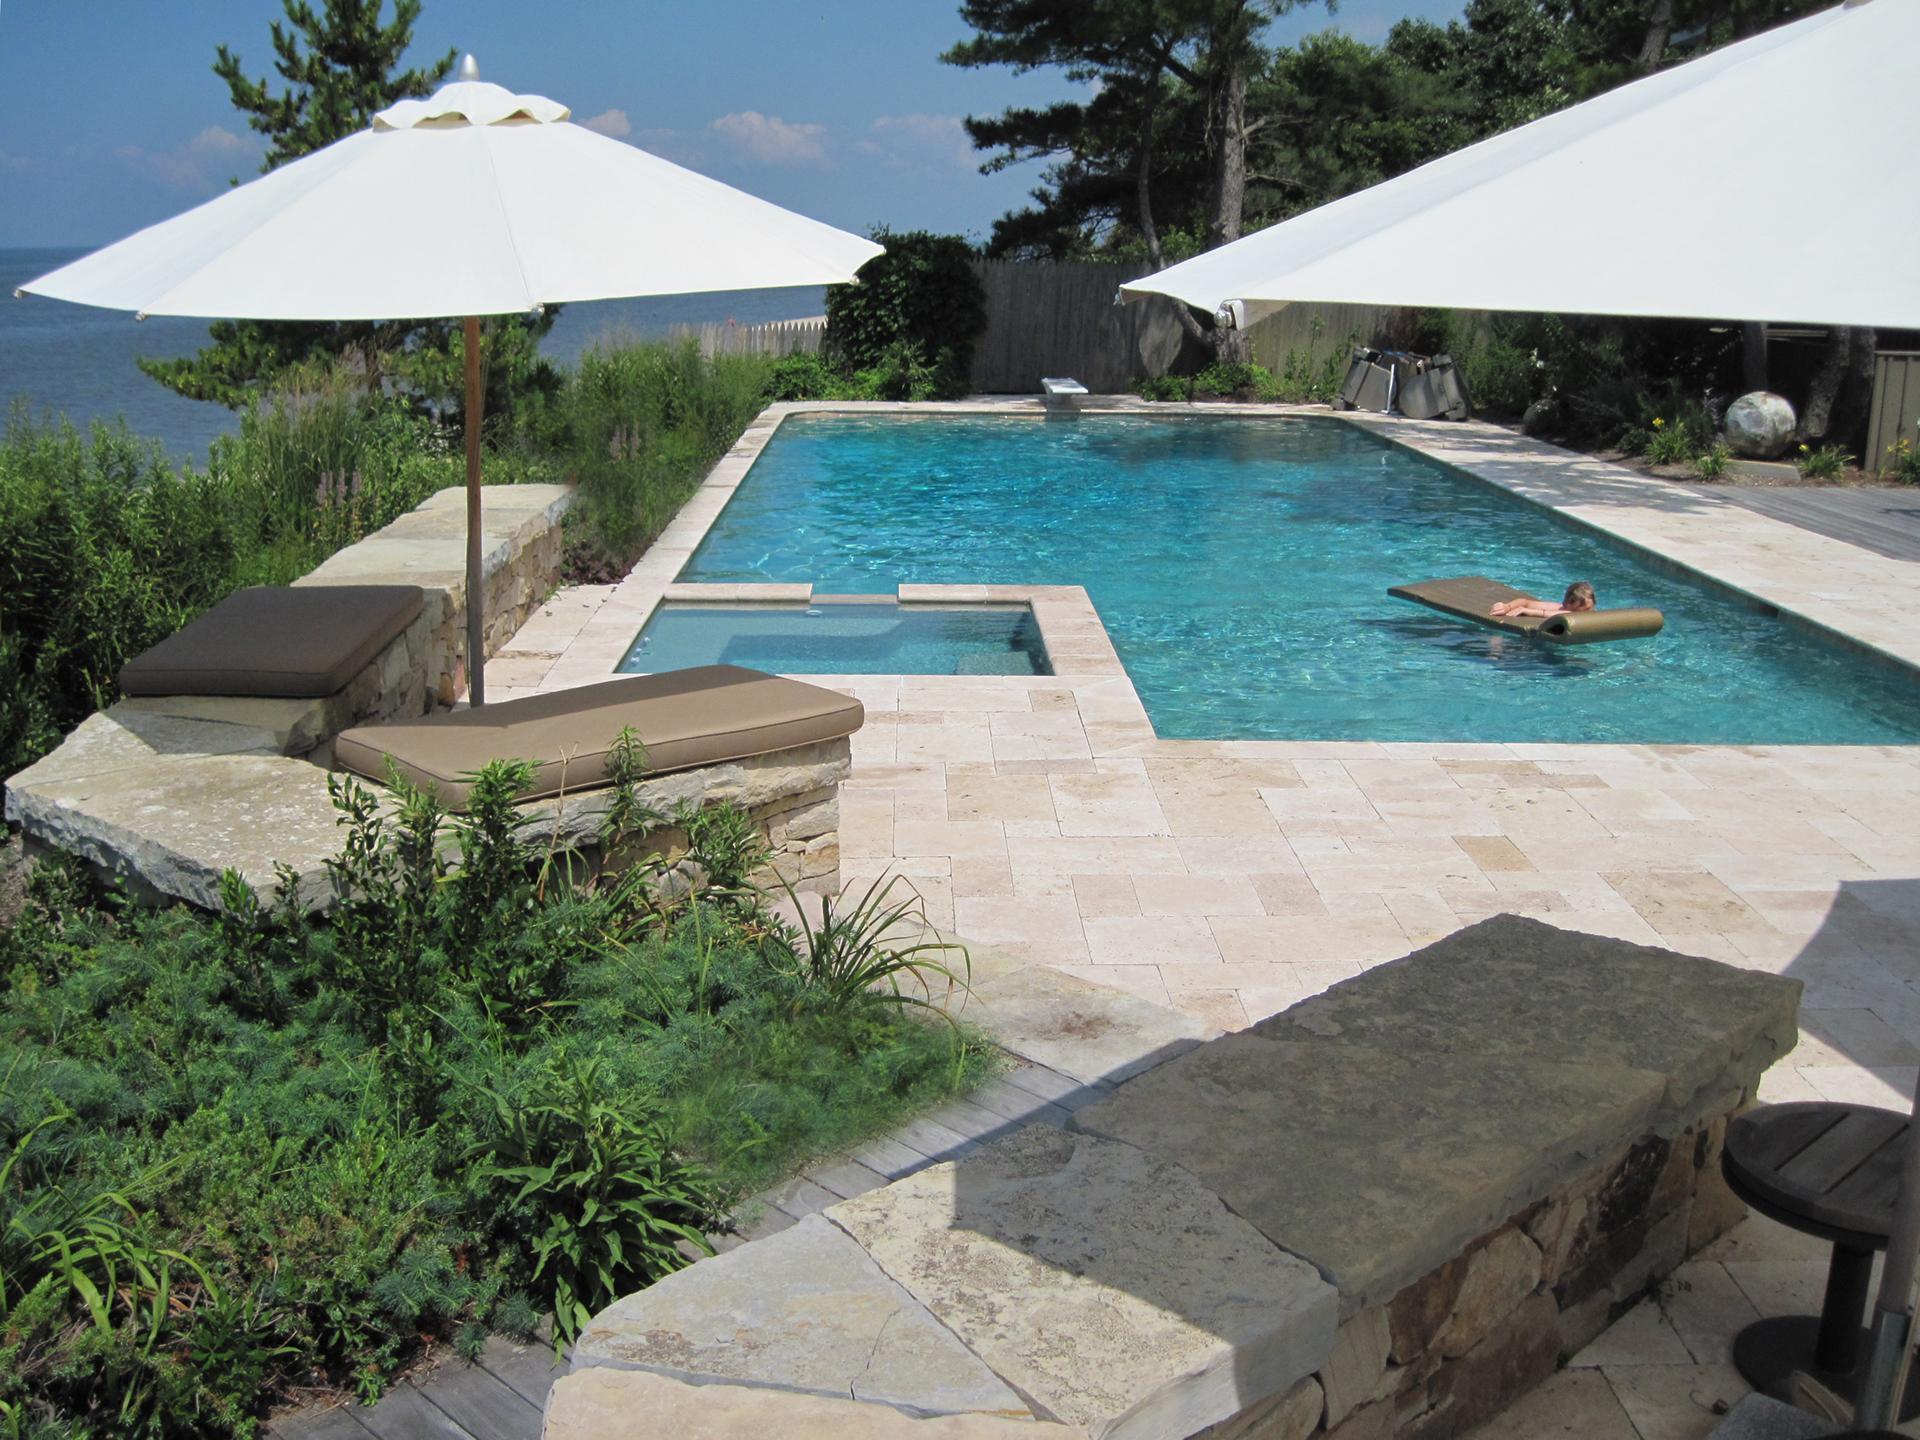 waterfront-landscape-design-custom-pool-paving-jersey-shore-nj